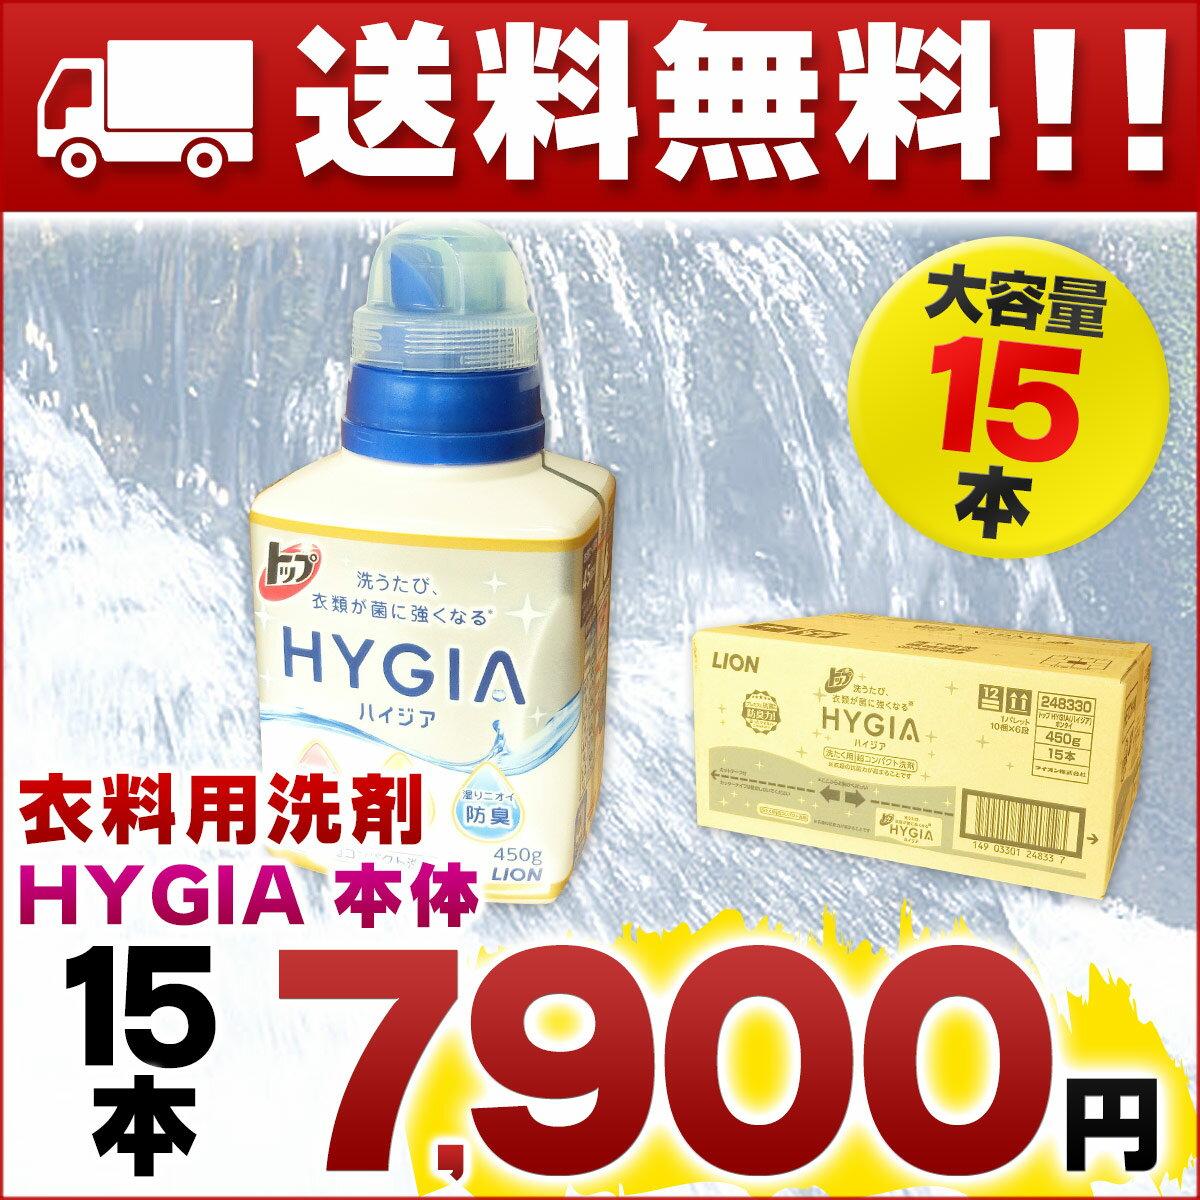 HYGIA ハイジア 液体洗剤 450g × 1...の商品画像